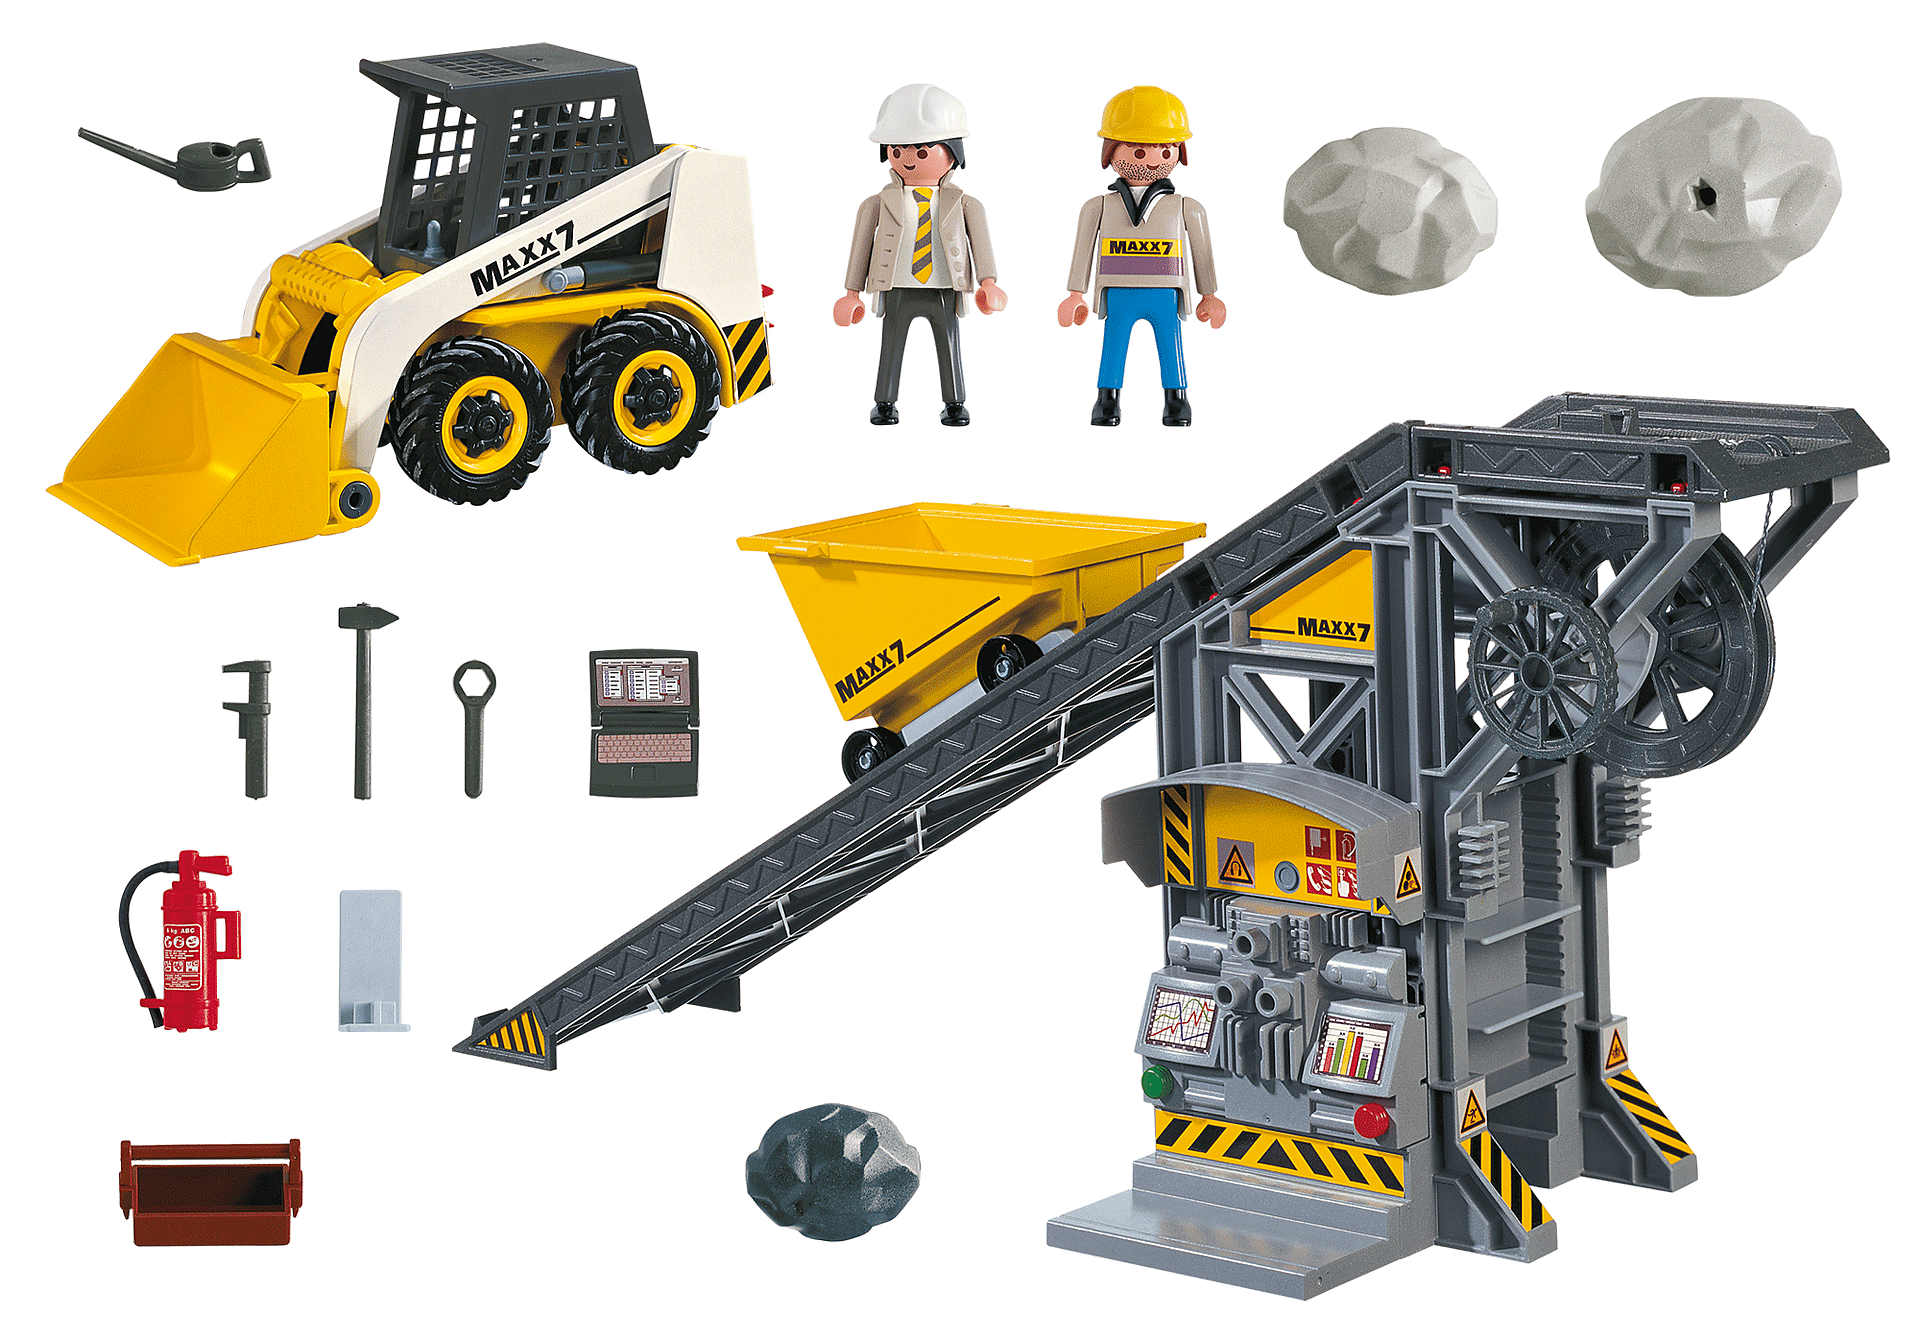 4041 Conveyor Belt with Mini Excavator zoom image3